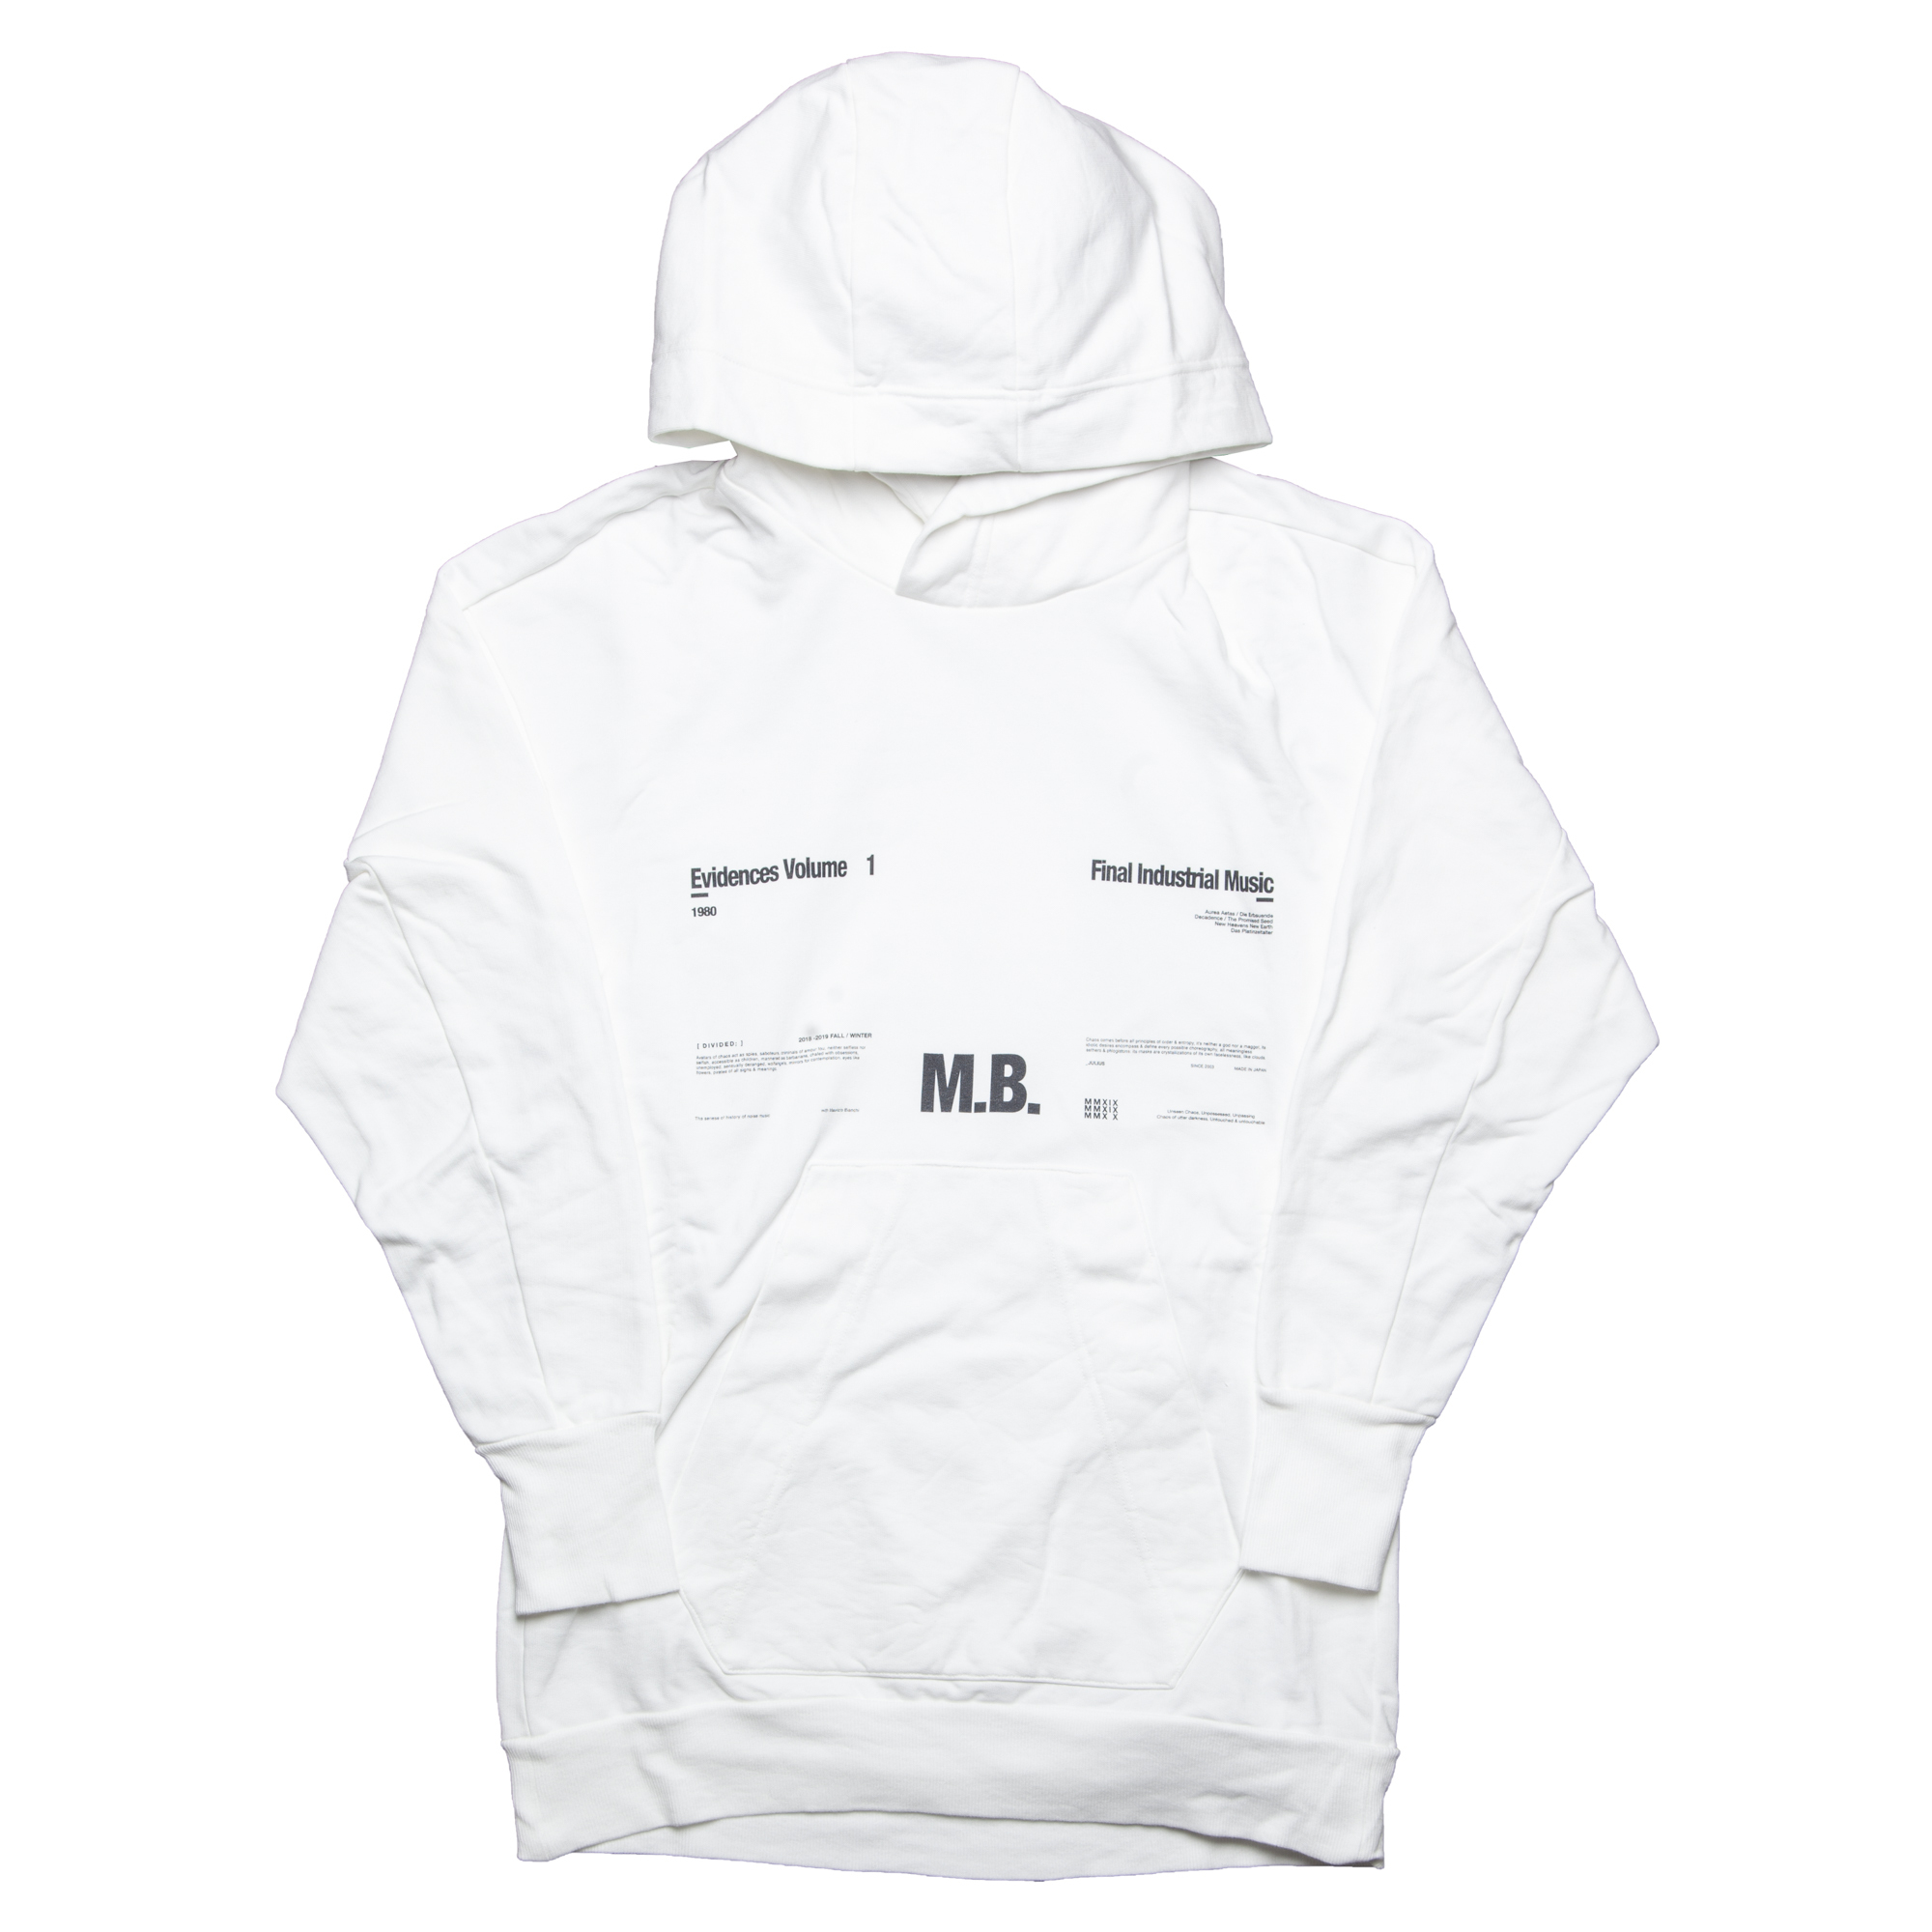 677CPM1-WHITE / M. B. ビッグフーディ